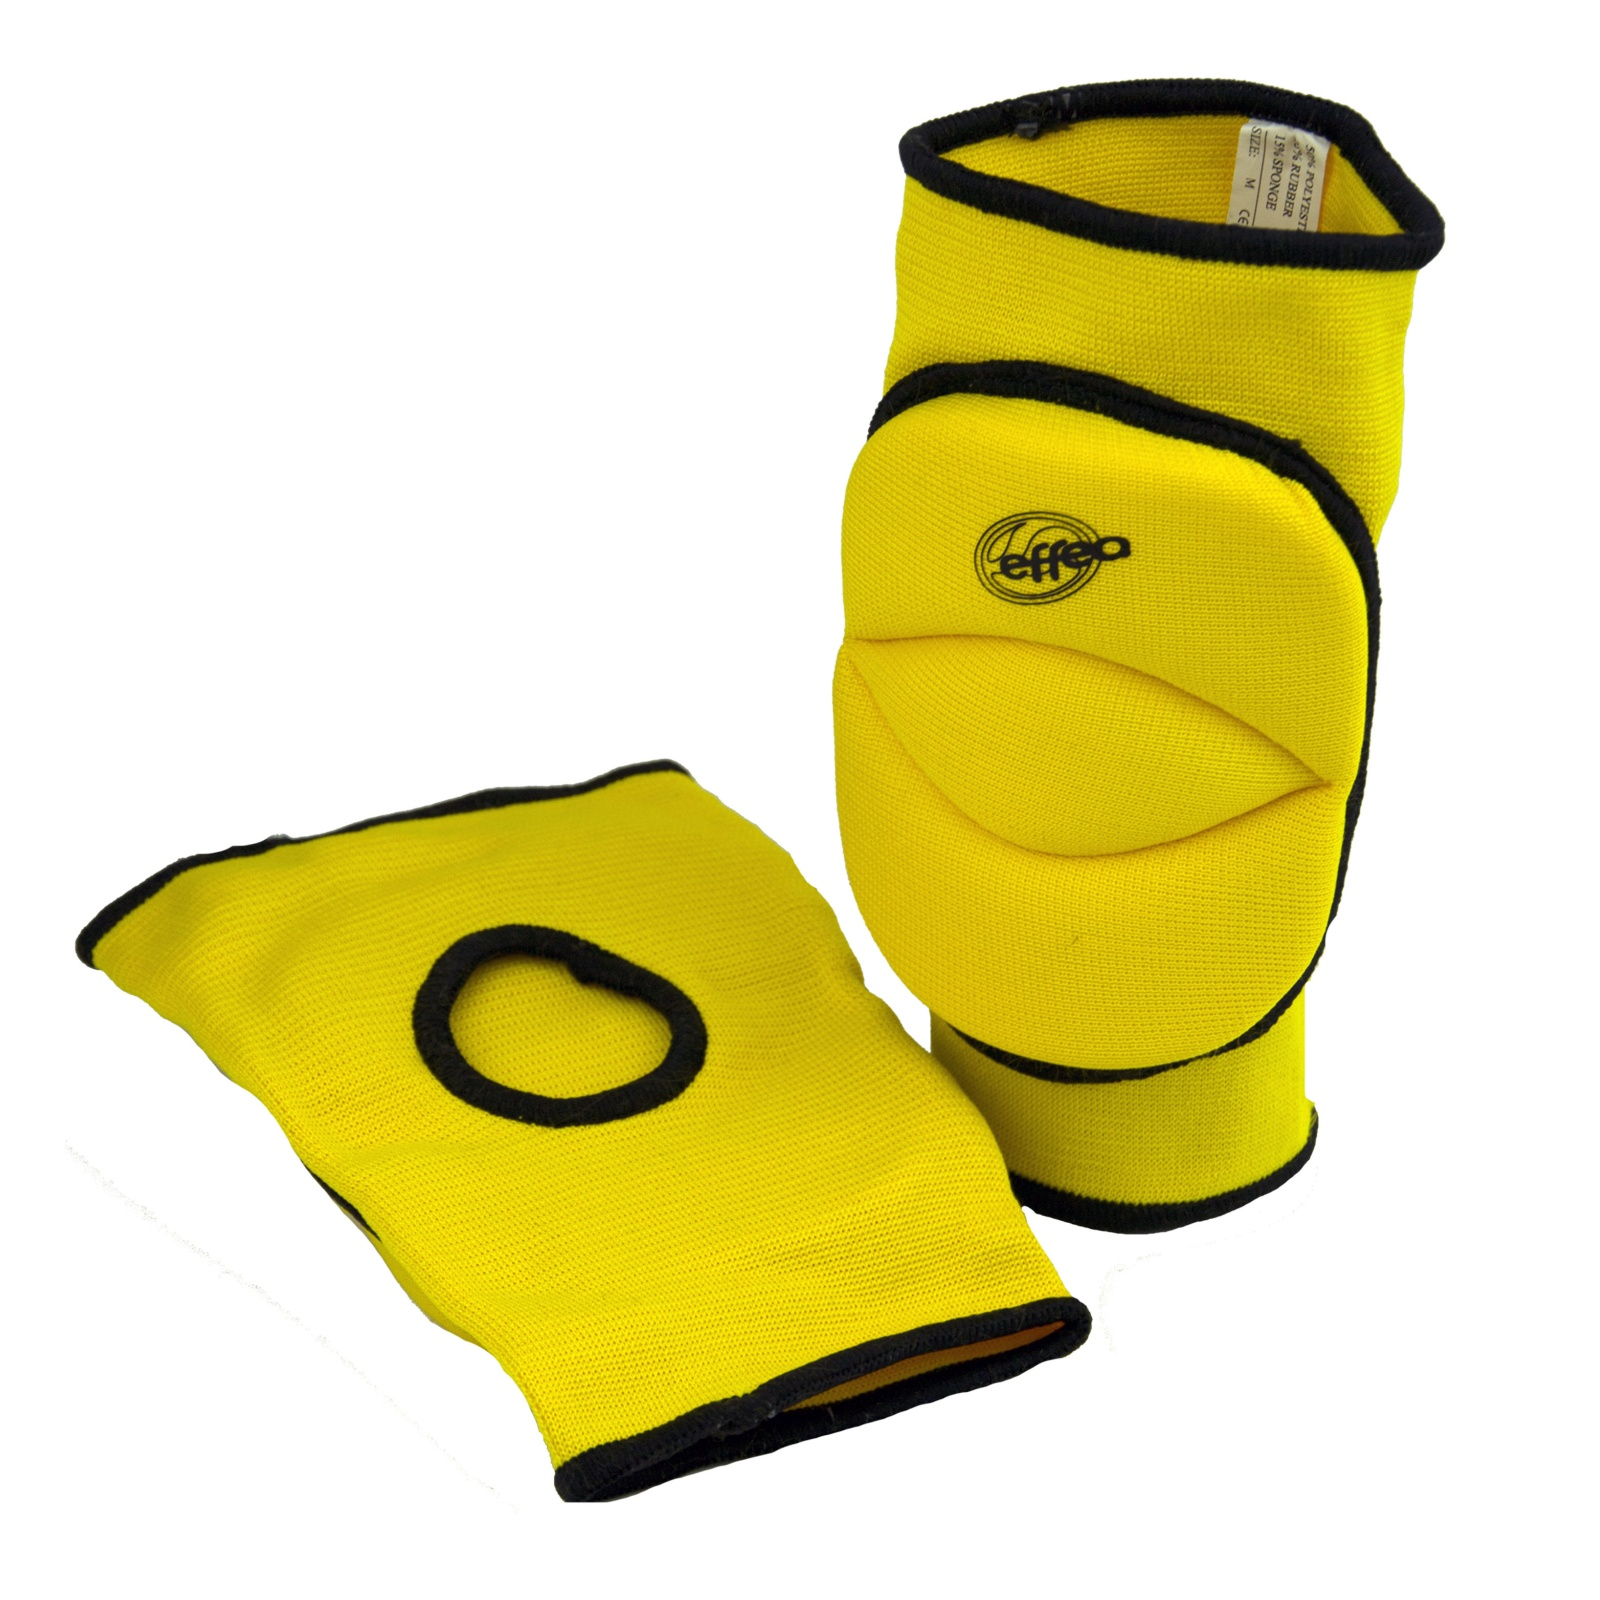 Volejbalové chrániče kolen EFFEA 6644 KD žluté